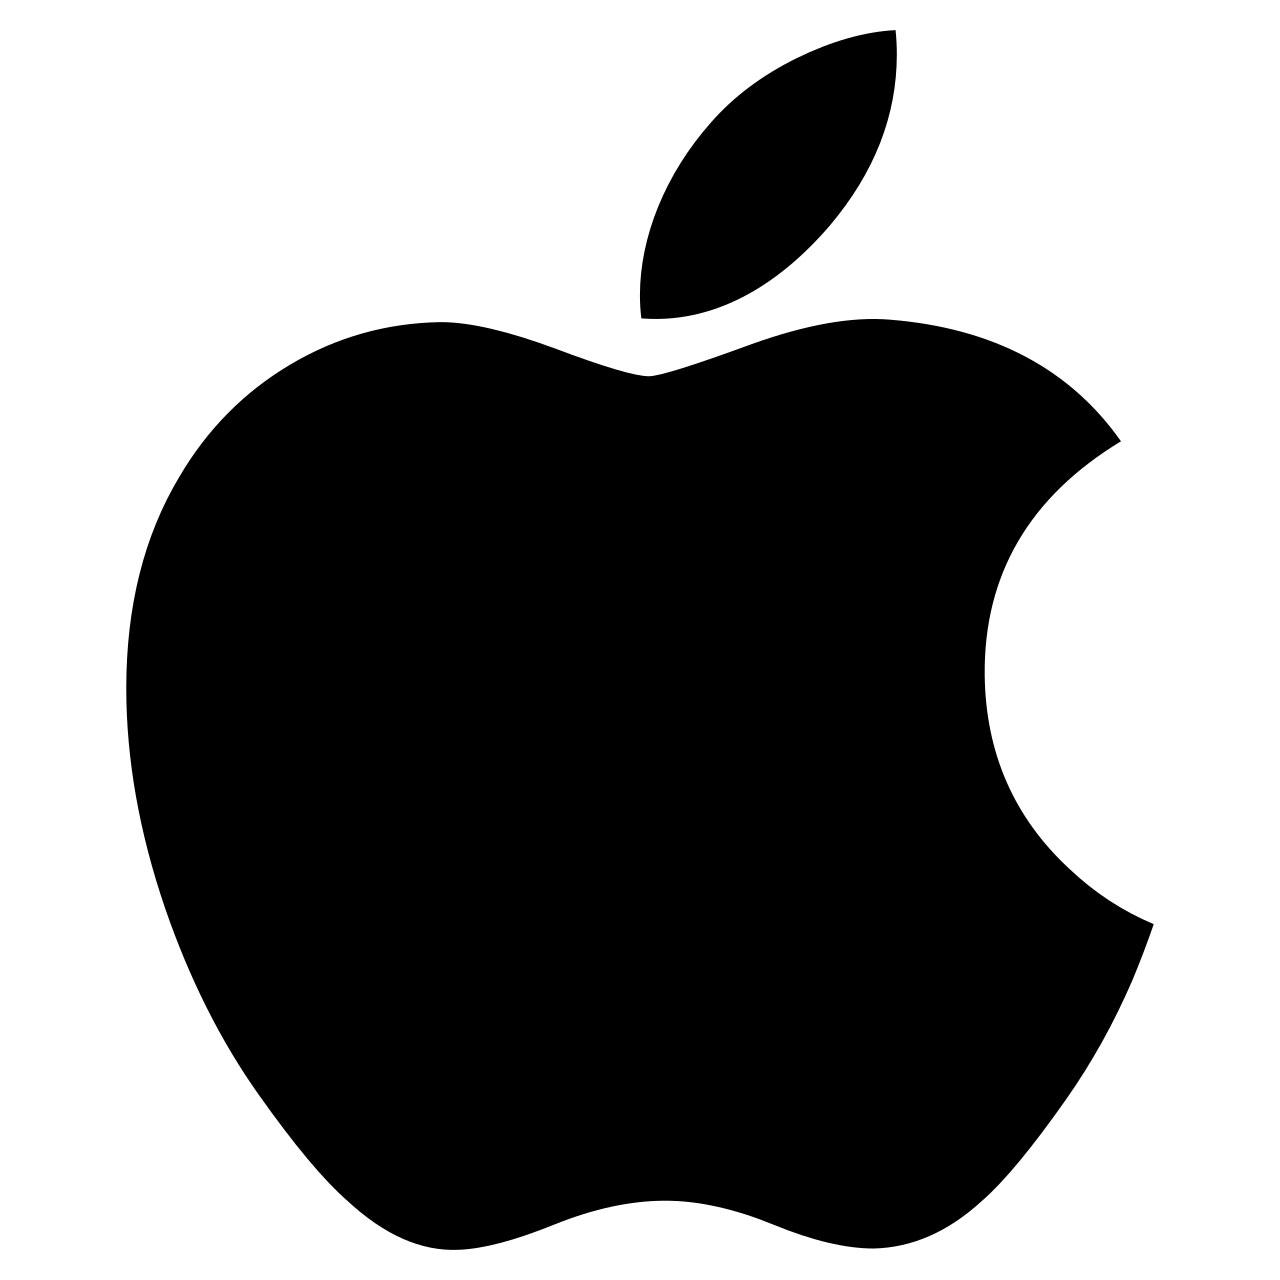 Third Tesla engineer departs for Apple thumbnail